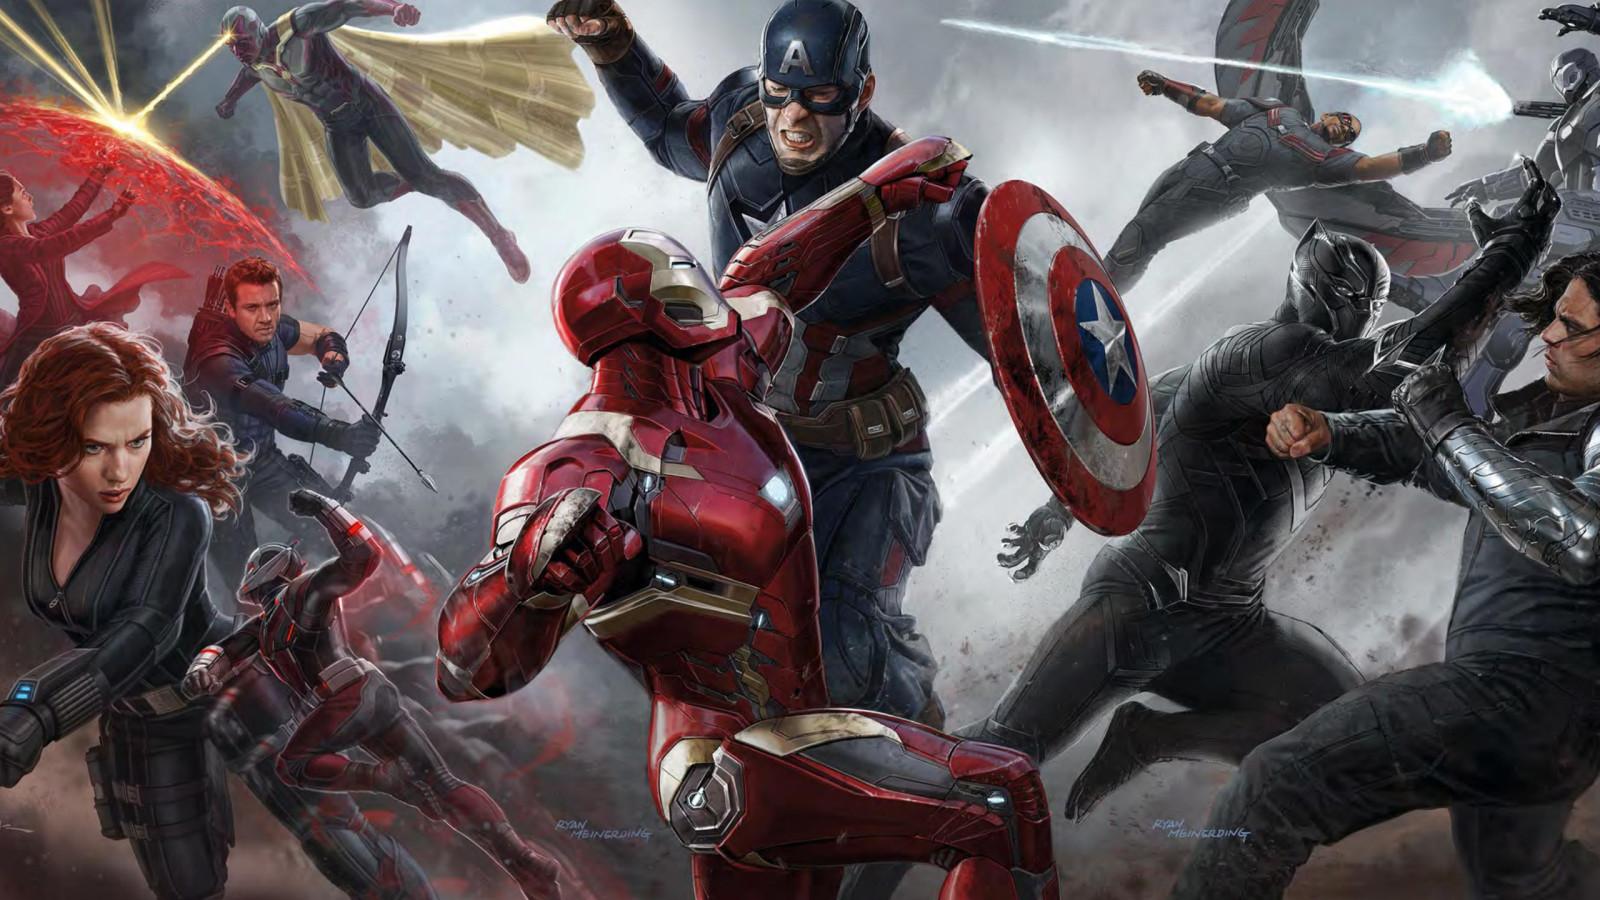 Captain America Civil War Concept Art Wallpaper DESKTOP BACKGROUNDS 1600x900